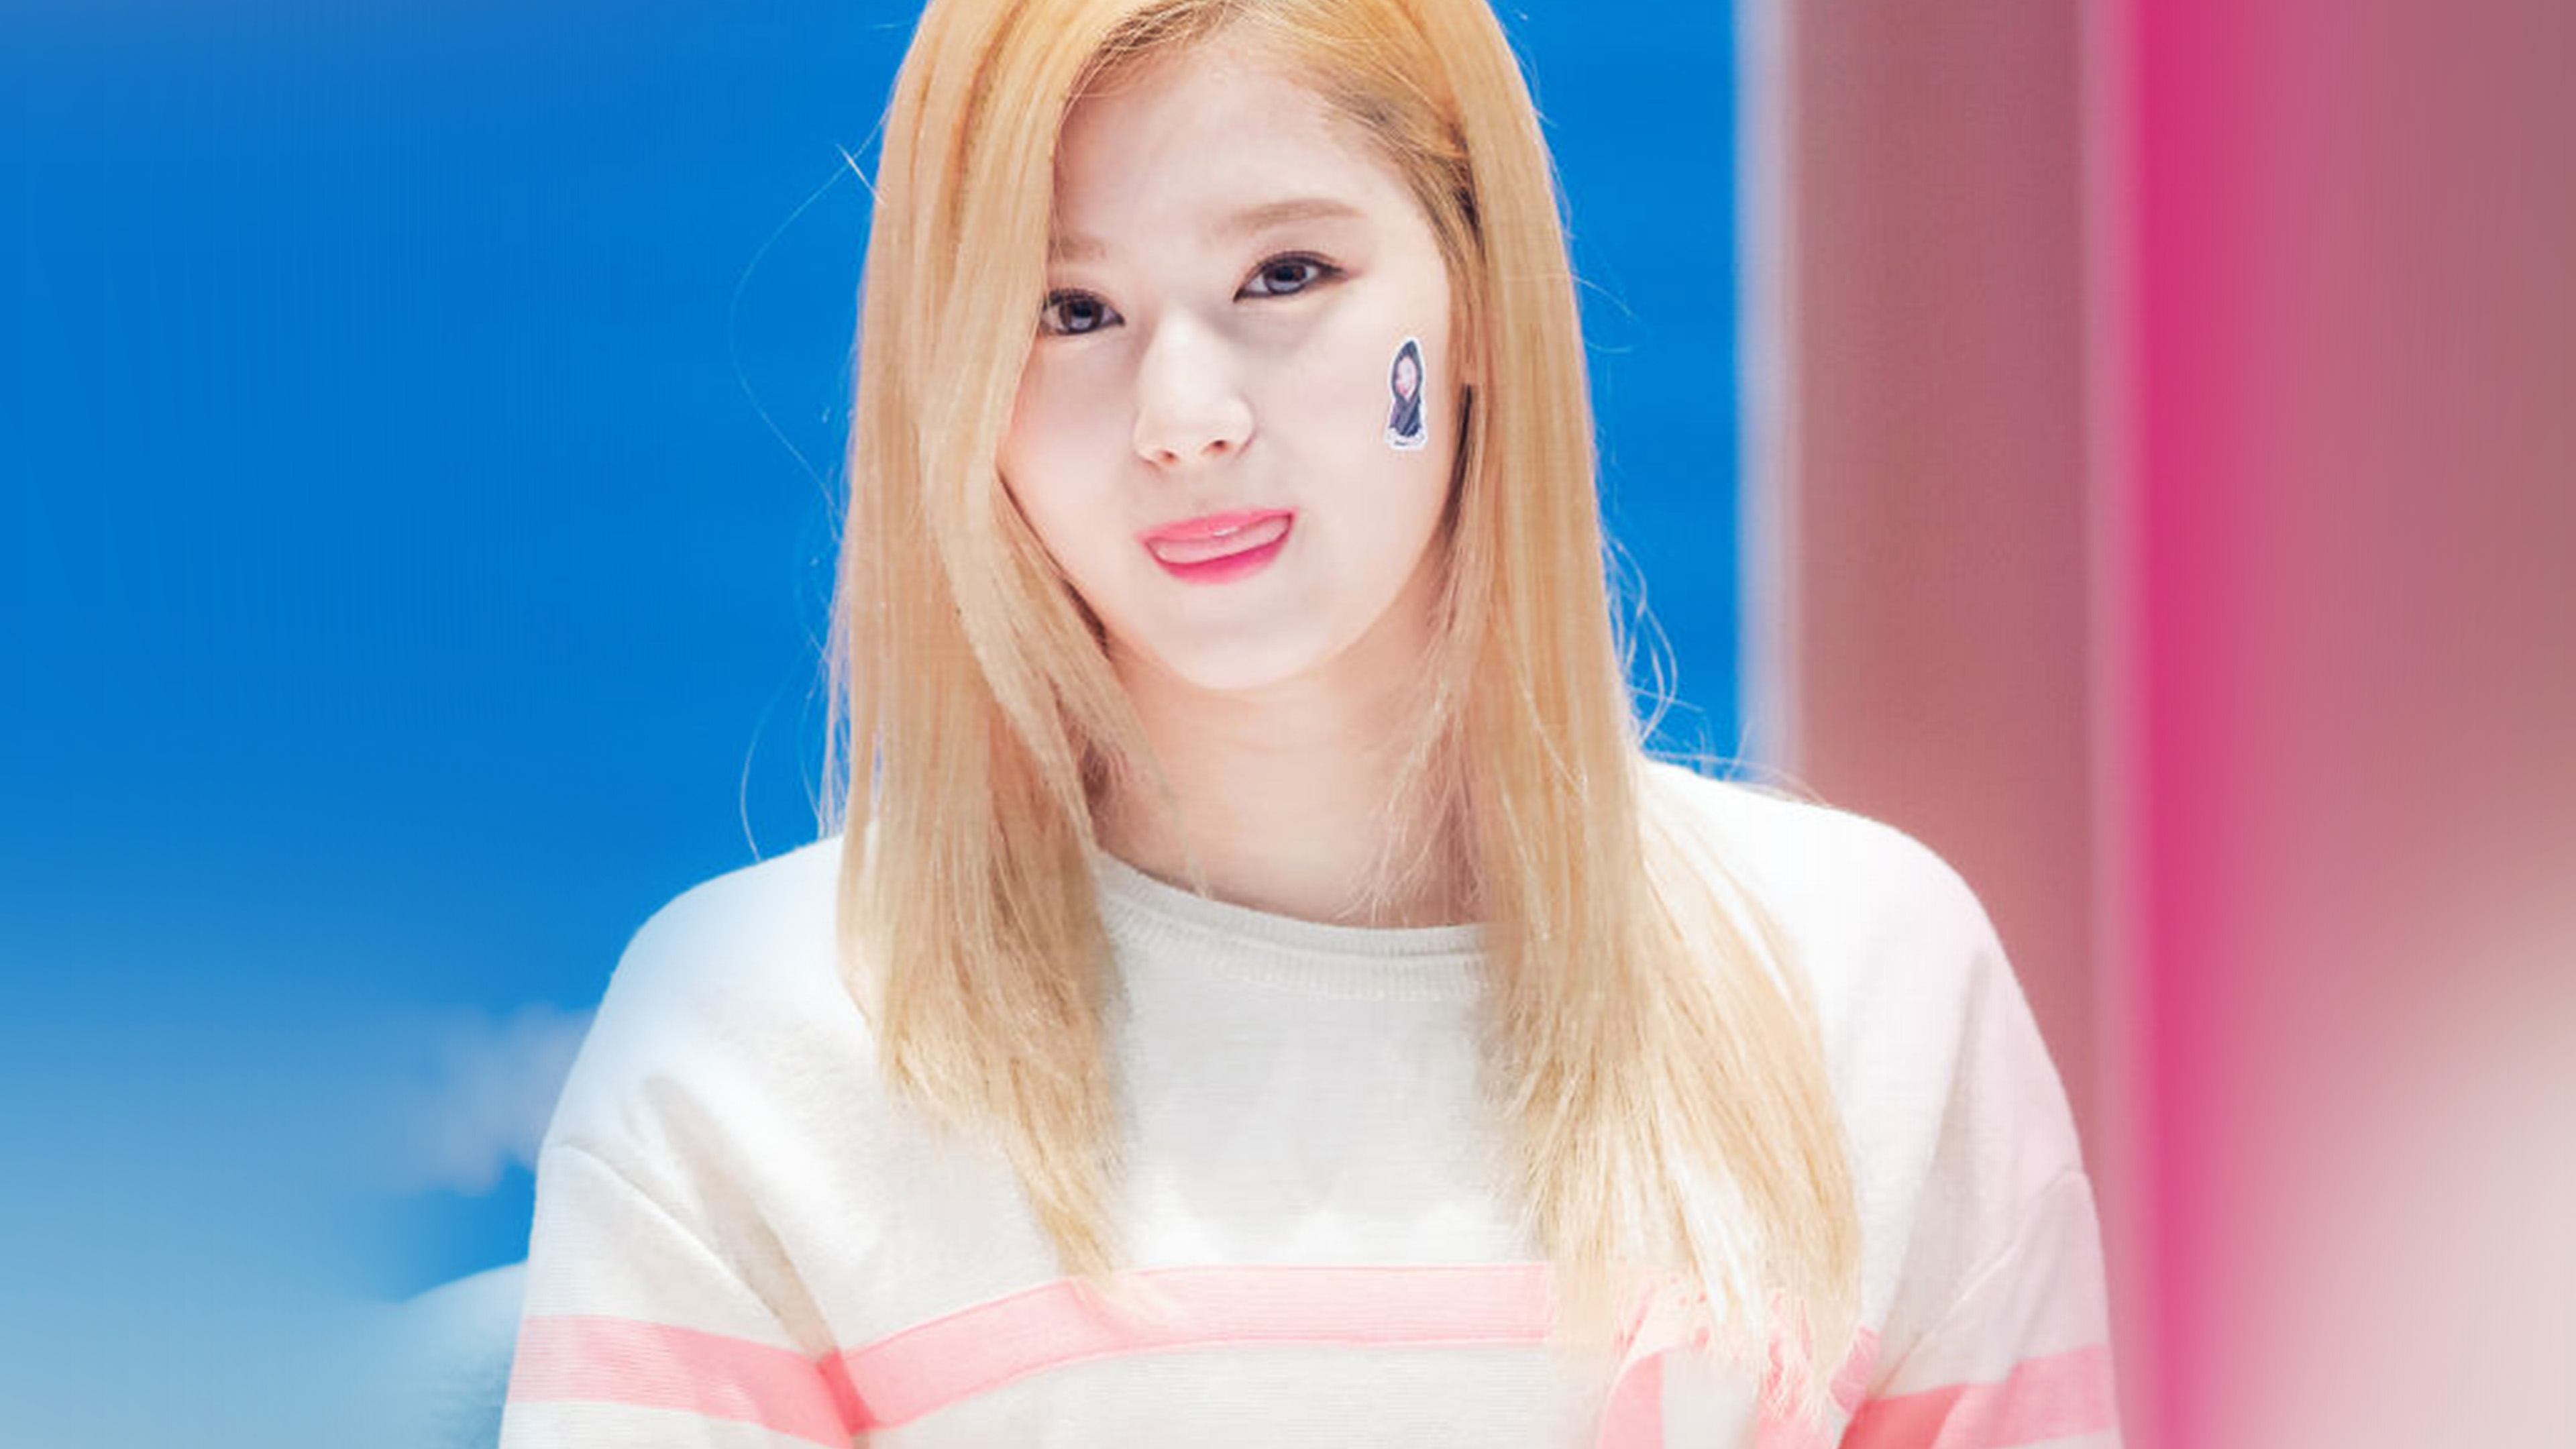 Cute Girly Christmas Wallpapers Hp73 Sana Twice Girl Kpop Group Cute Wallpaper